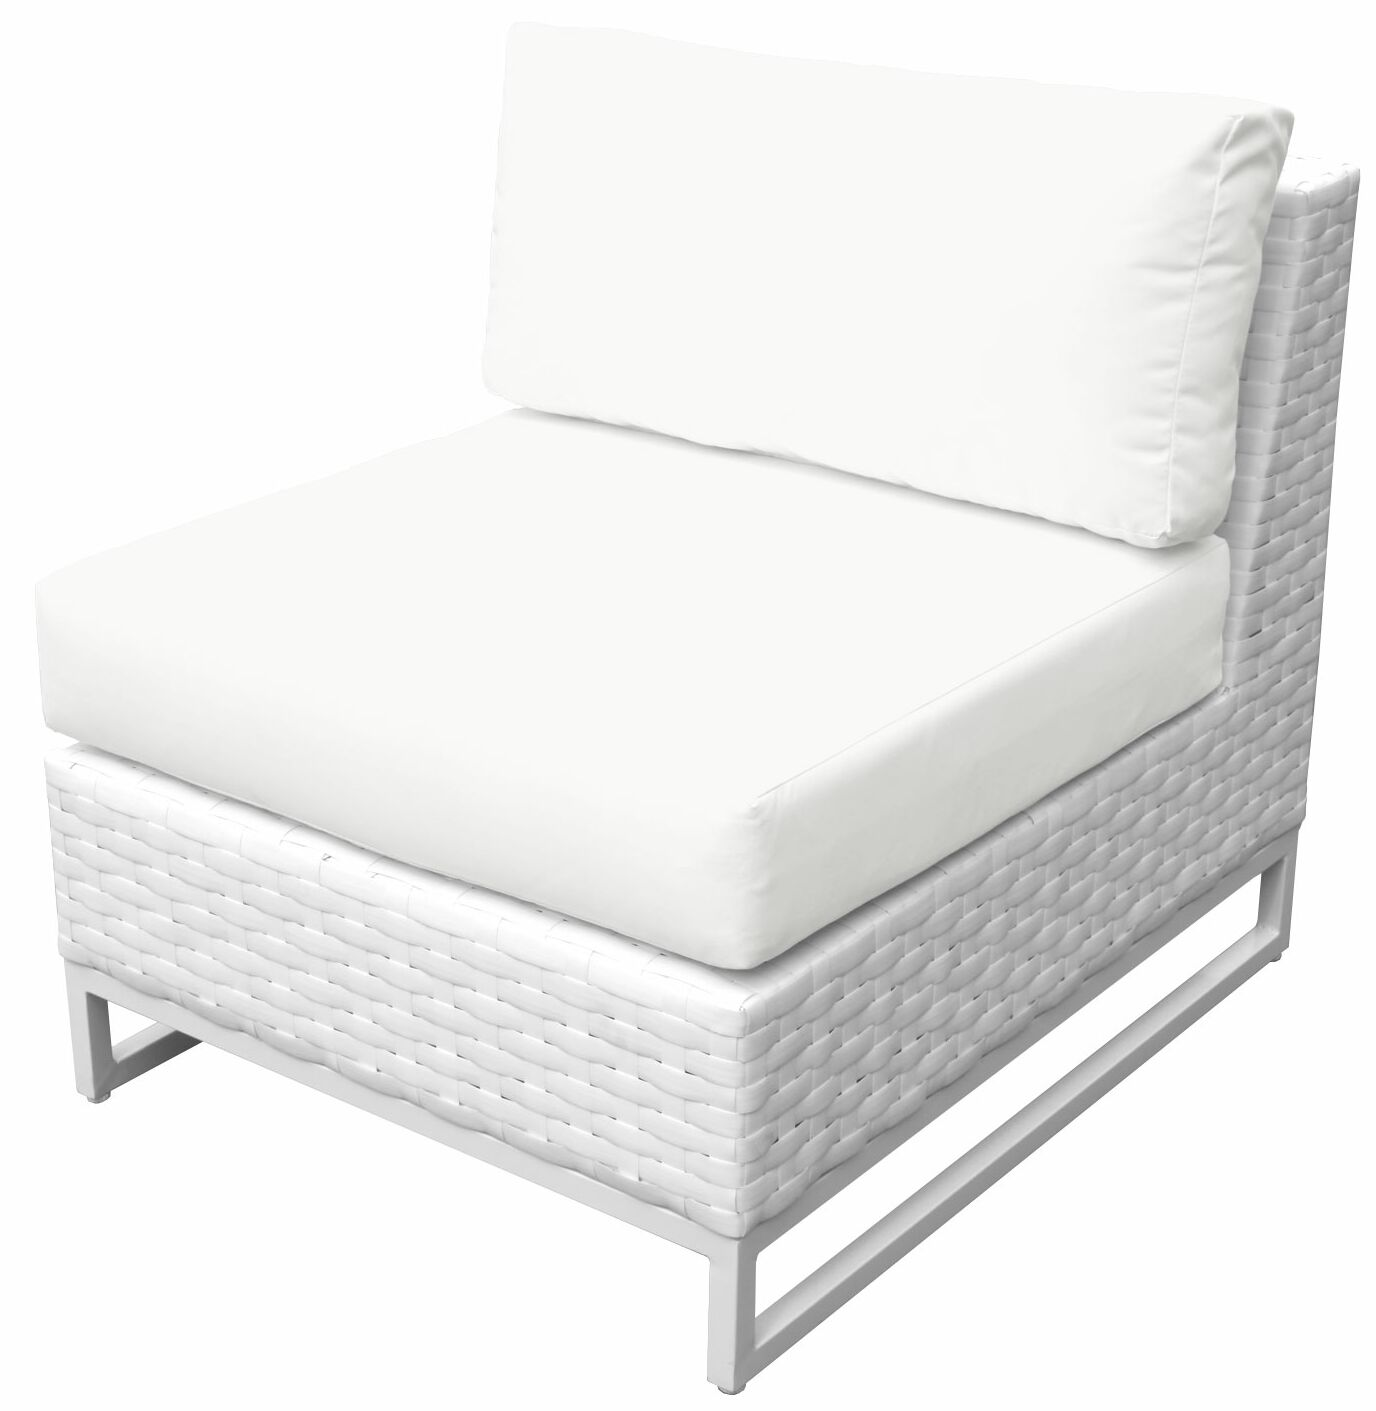 Miami 6 Piece Sofa Set with Cushions Fabric: Aruba